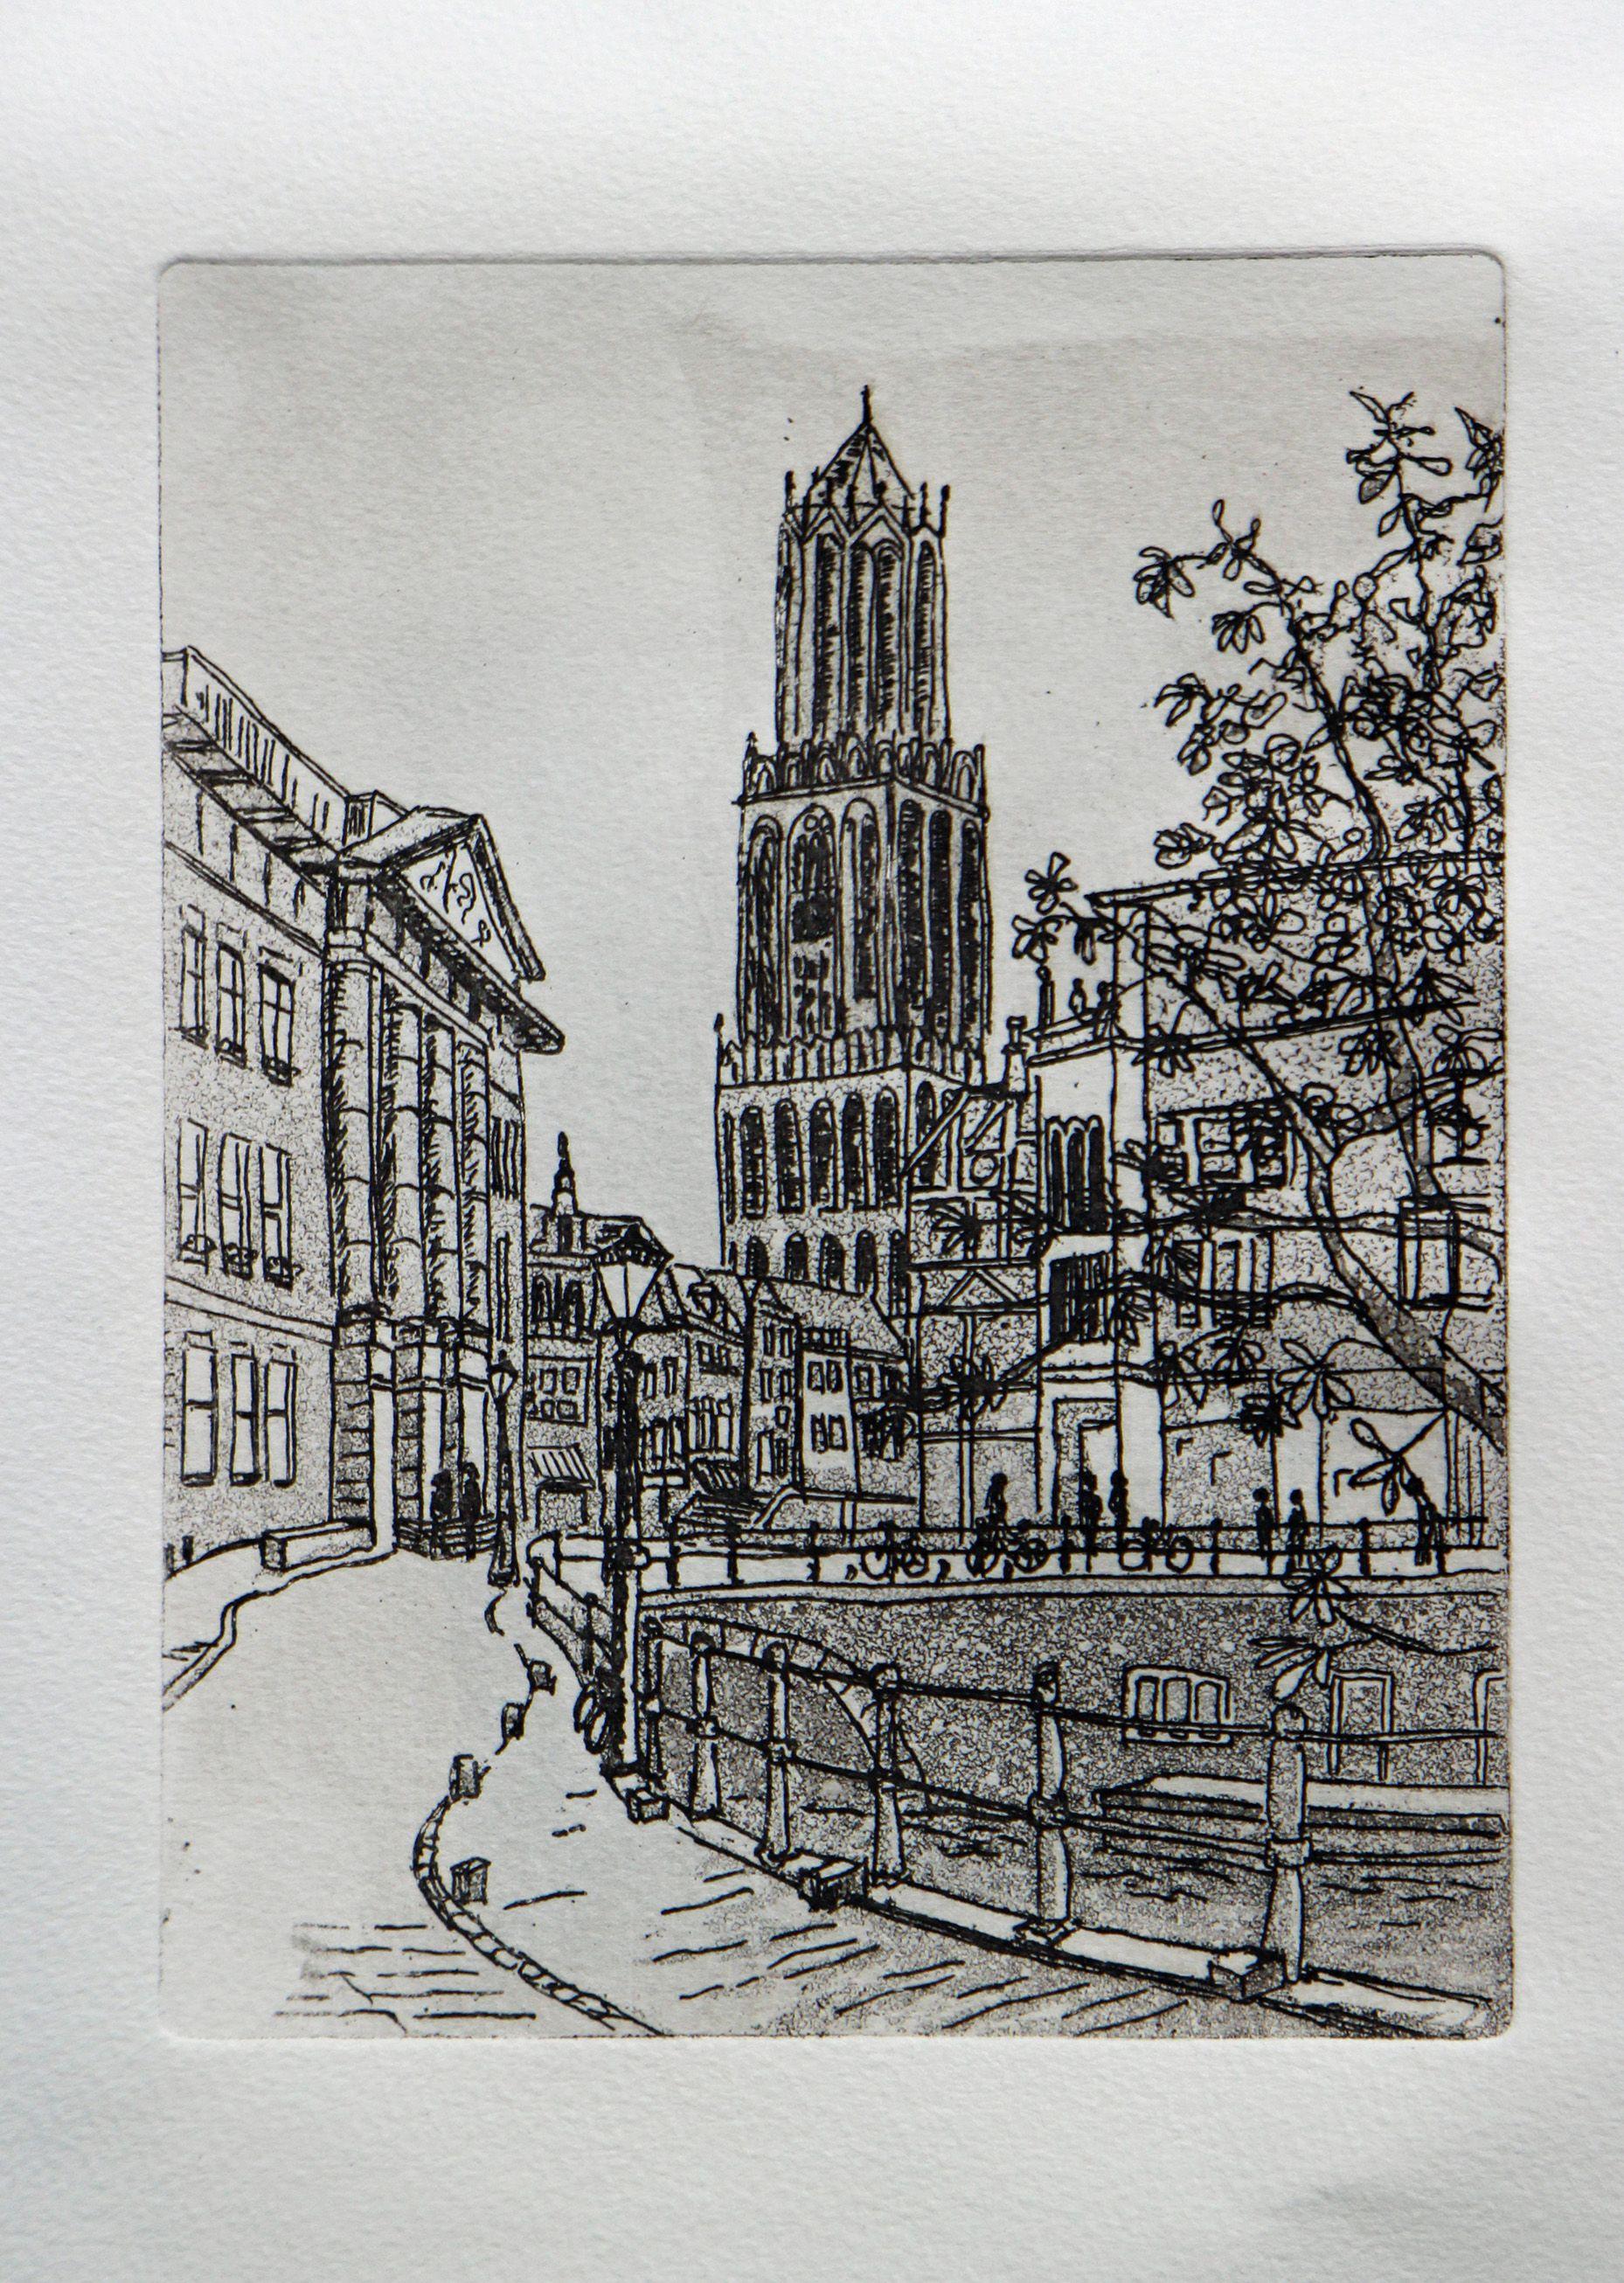 De Dom van Utrecht Ets by Alex Olzheim